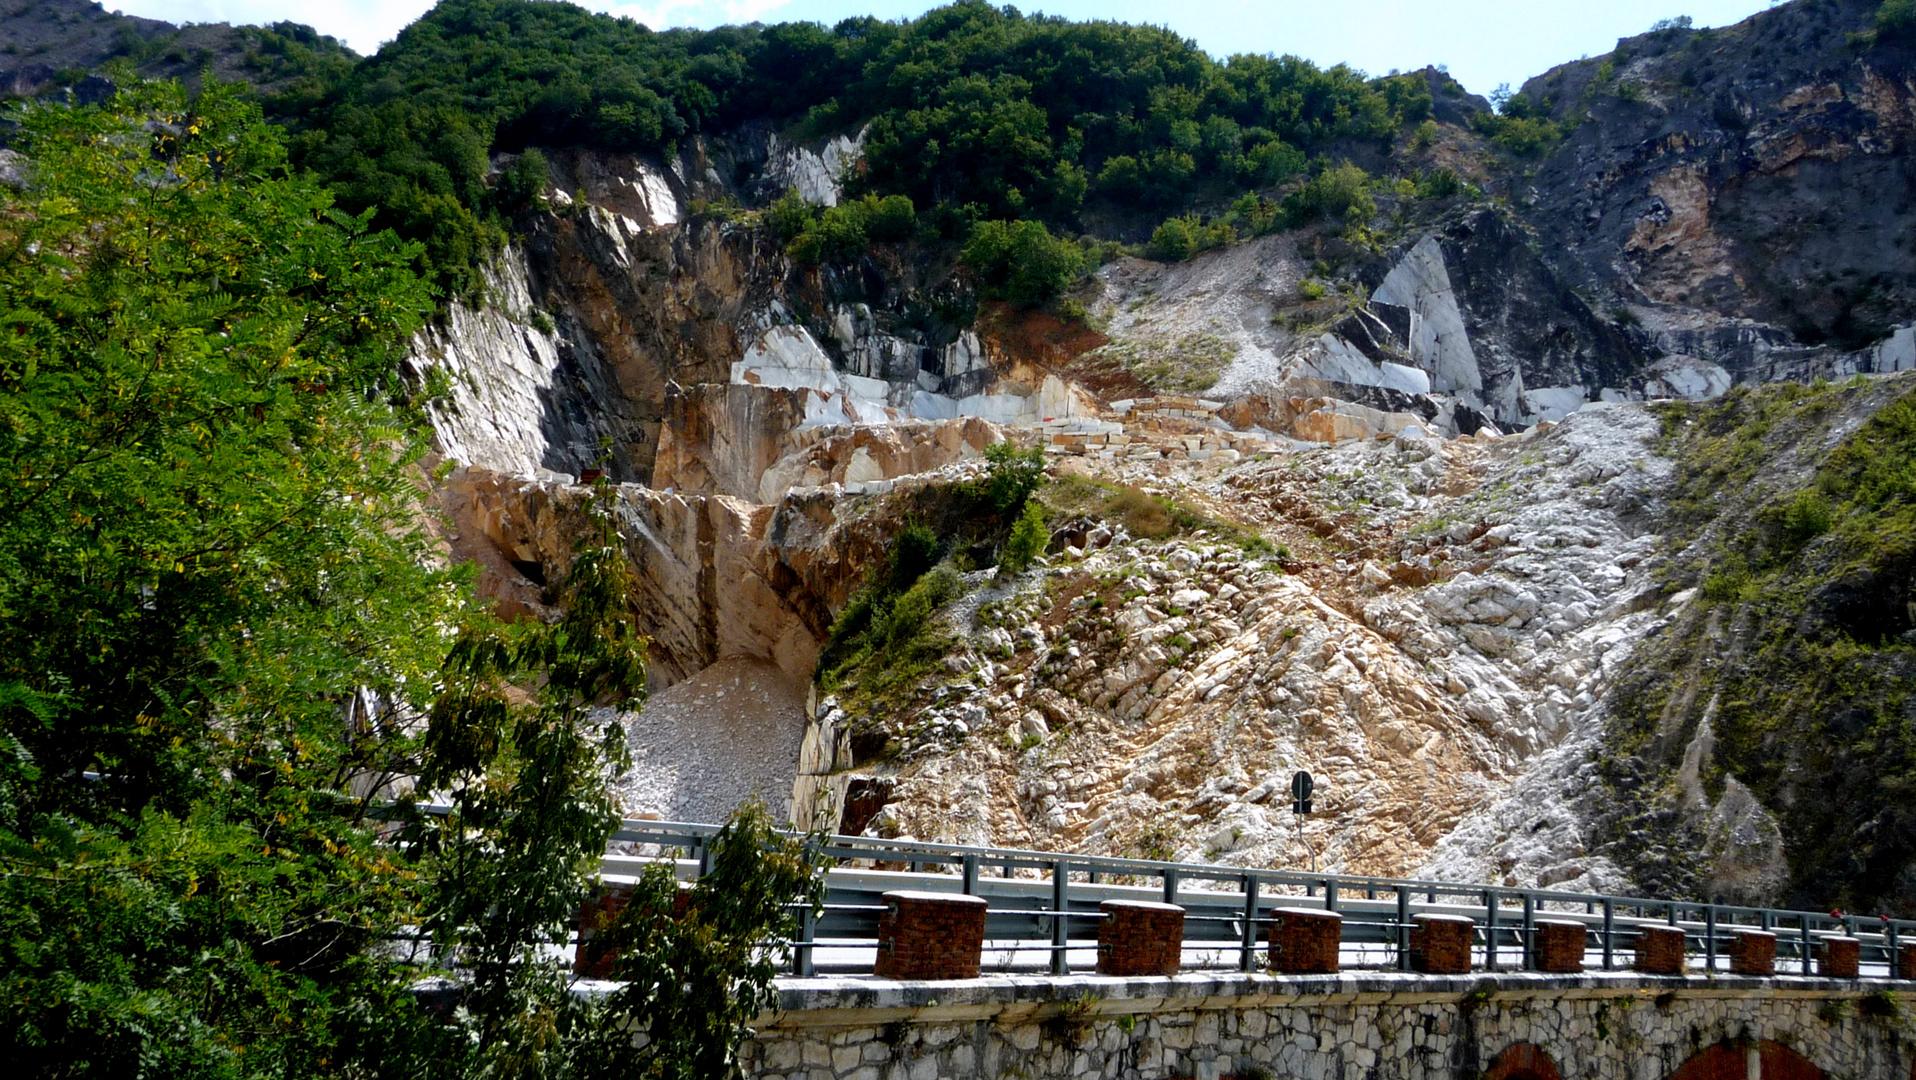 Marble of Carrara